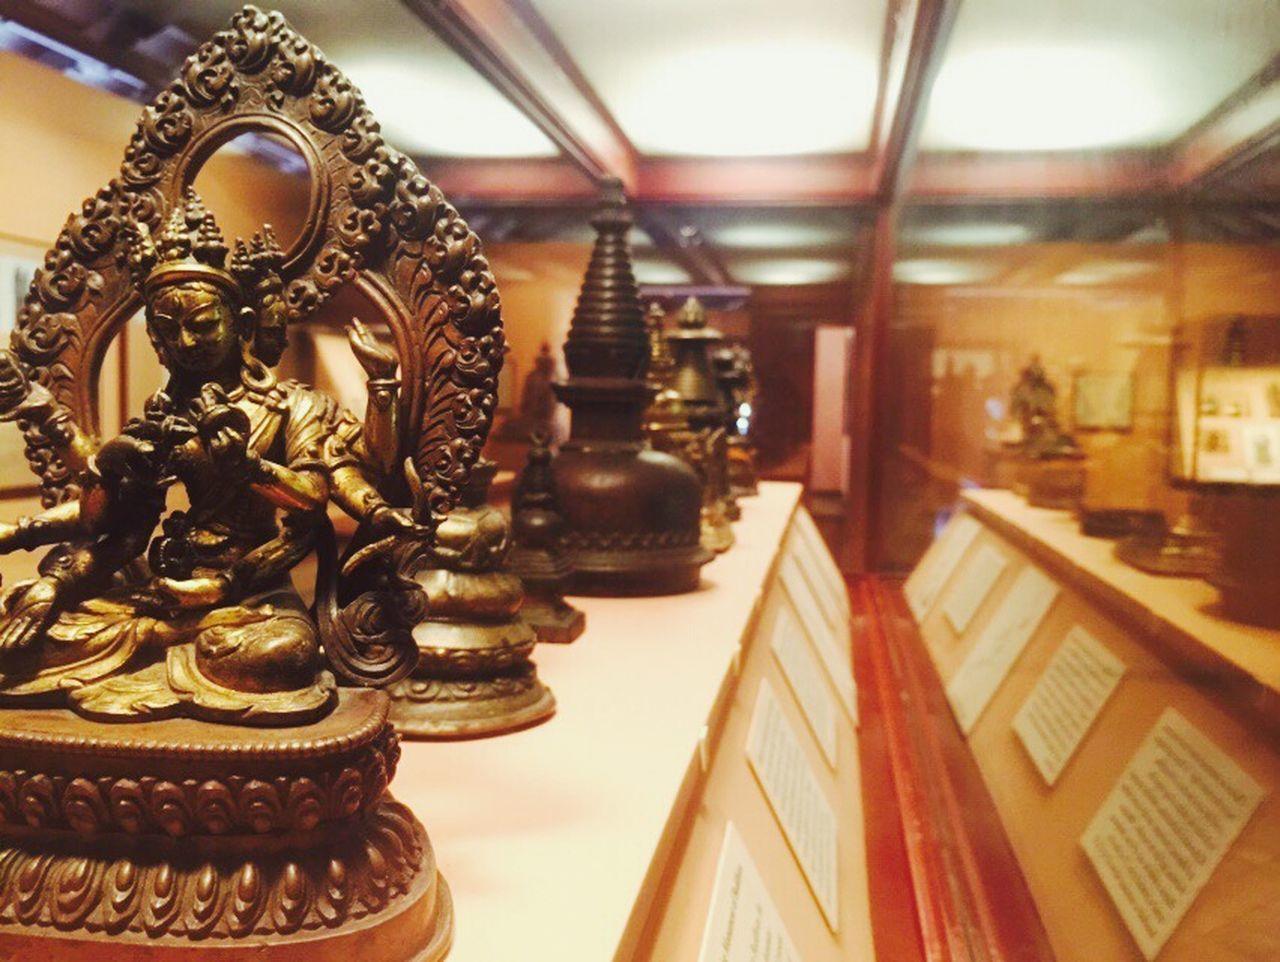 Statues Old Art Style Museum Visit Artistic Handicraft Nepalese Style Design EyeEm Best Shots EyeEm Gallery Peace Beauty Photography Beautiful Nepal Nepal